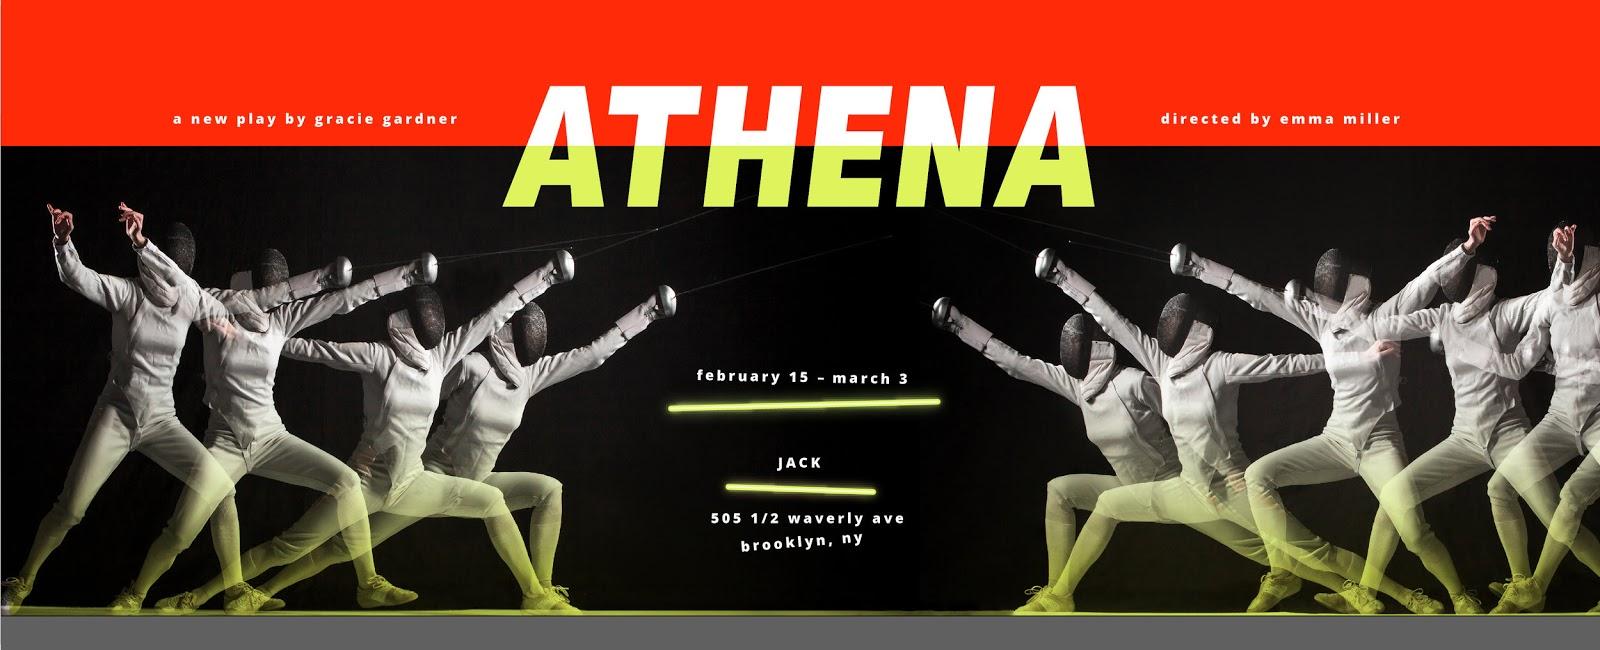 Charles Gershman Interviews Gracie Gardner On Her New Play Athena